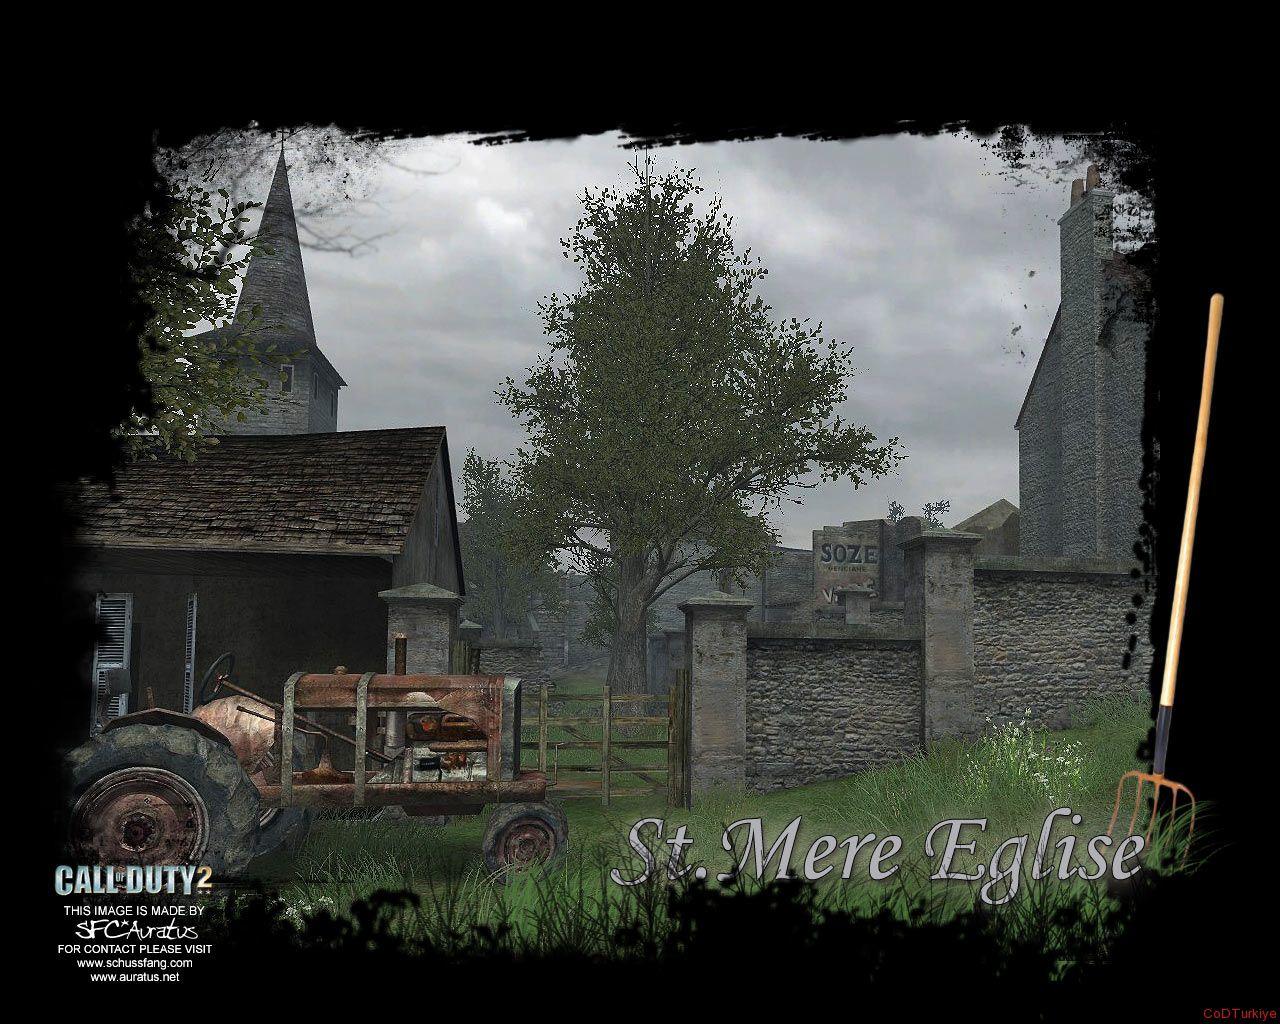 Call of Duty 2 Map Dawnville